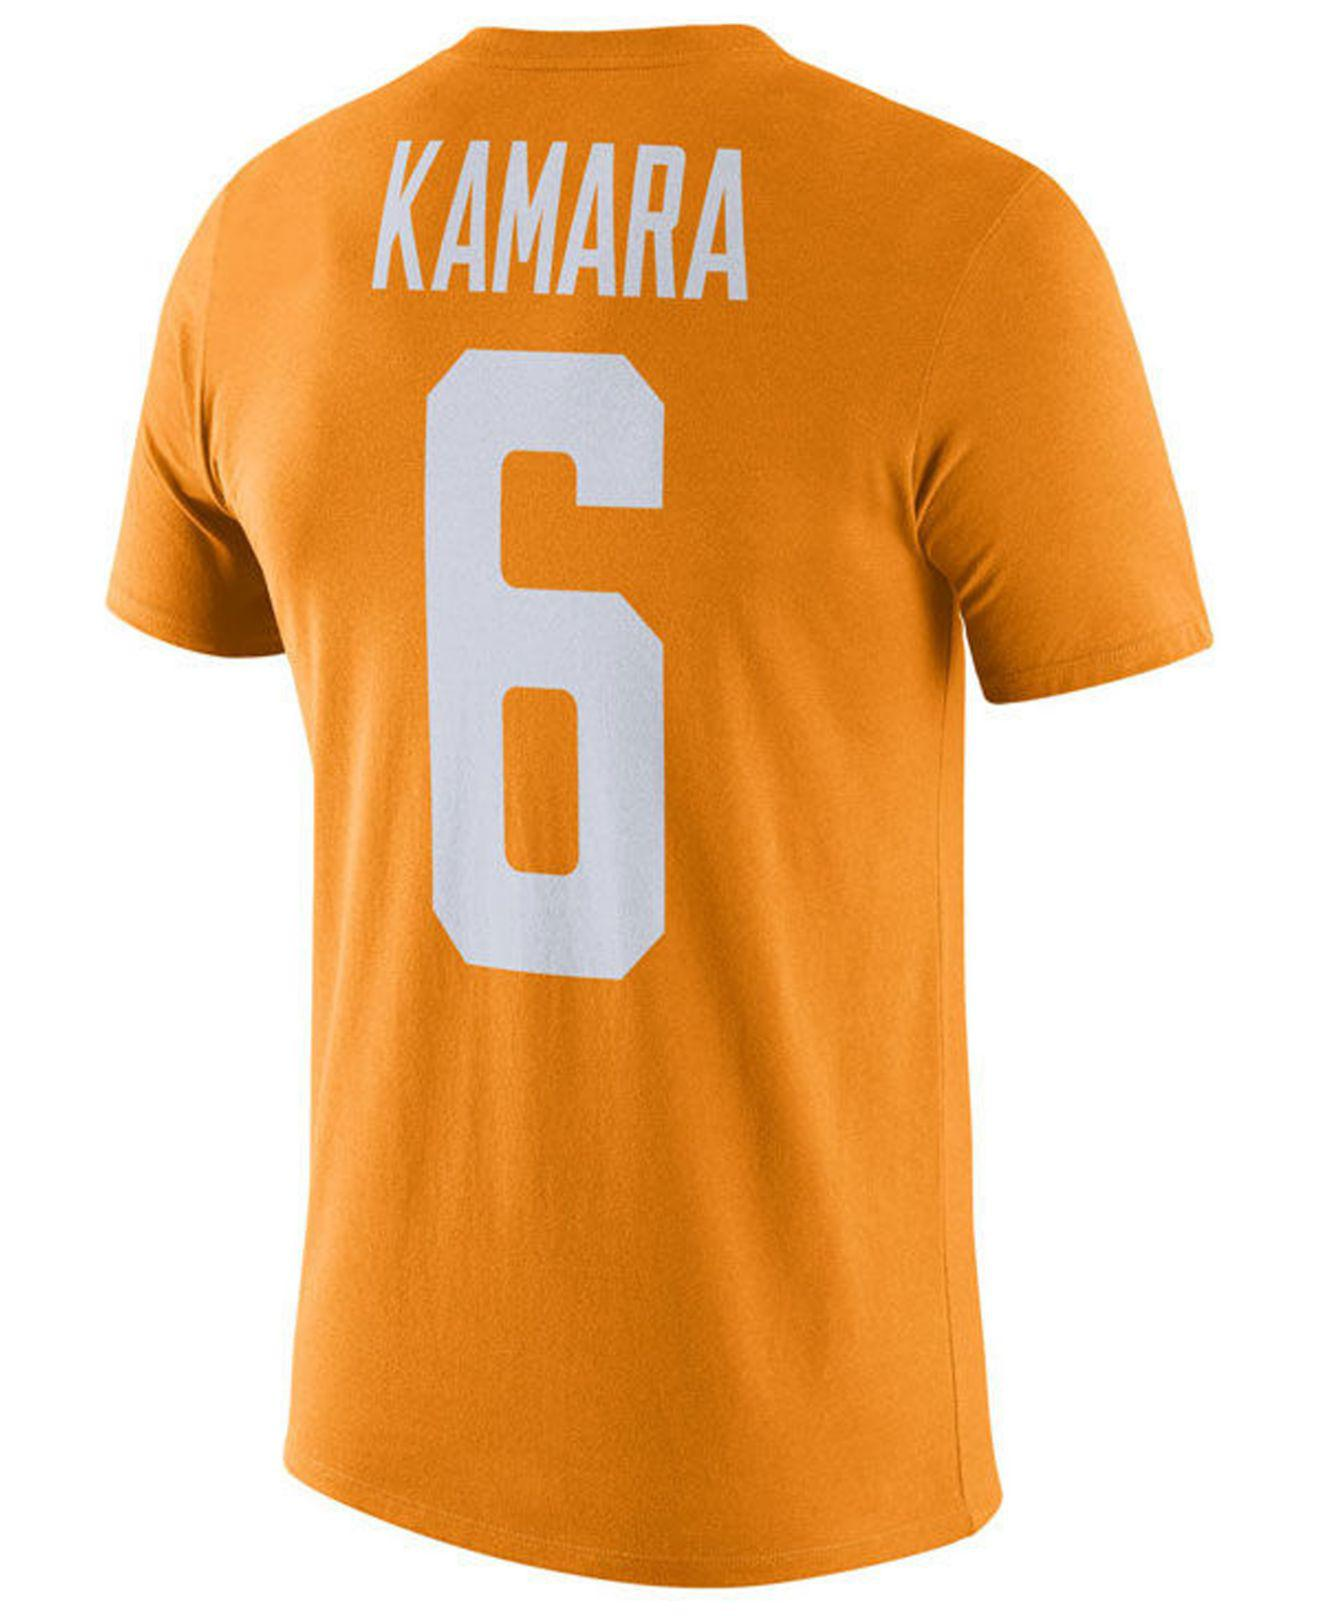 fe123a93715 Nike - Orange Alvin Kamara Tennessee Volunteers Future Star Replica T-shirt  for Men -. View fullscreen